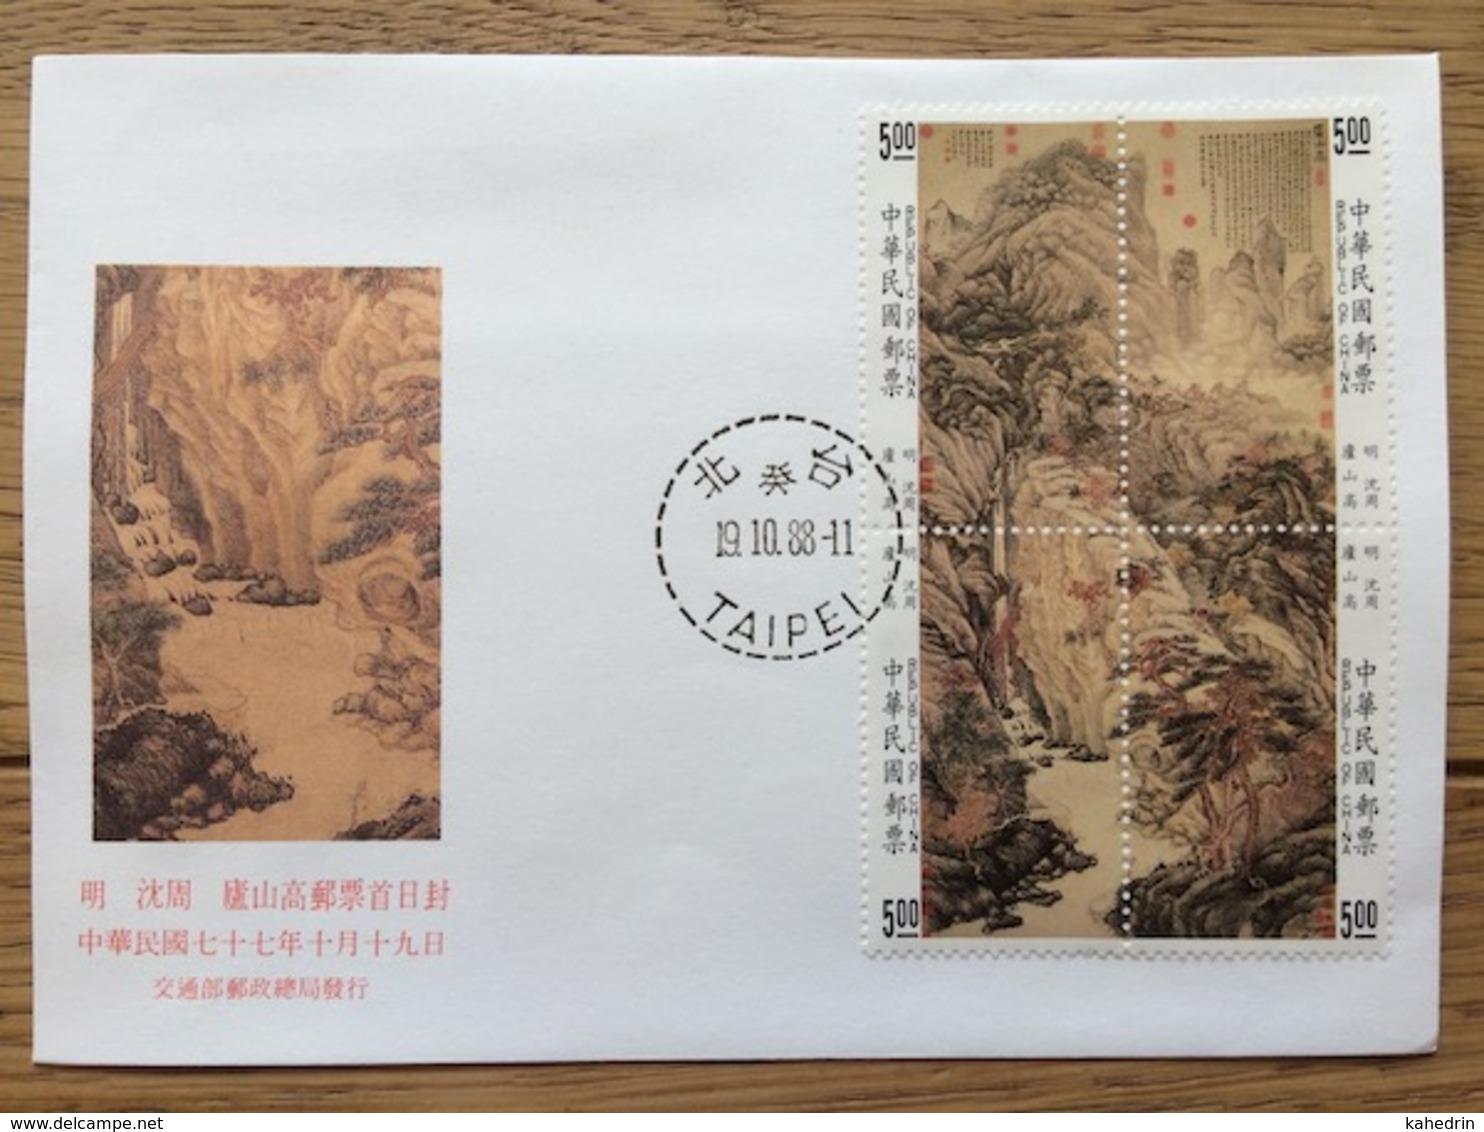 Taiwan 1988, FDC: Painting By Shen Chou Lofty Mount Lu - FDC